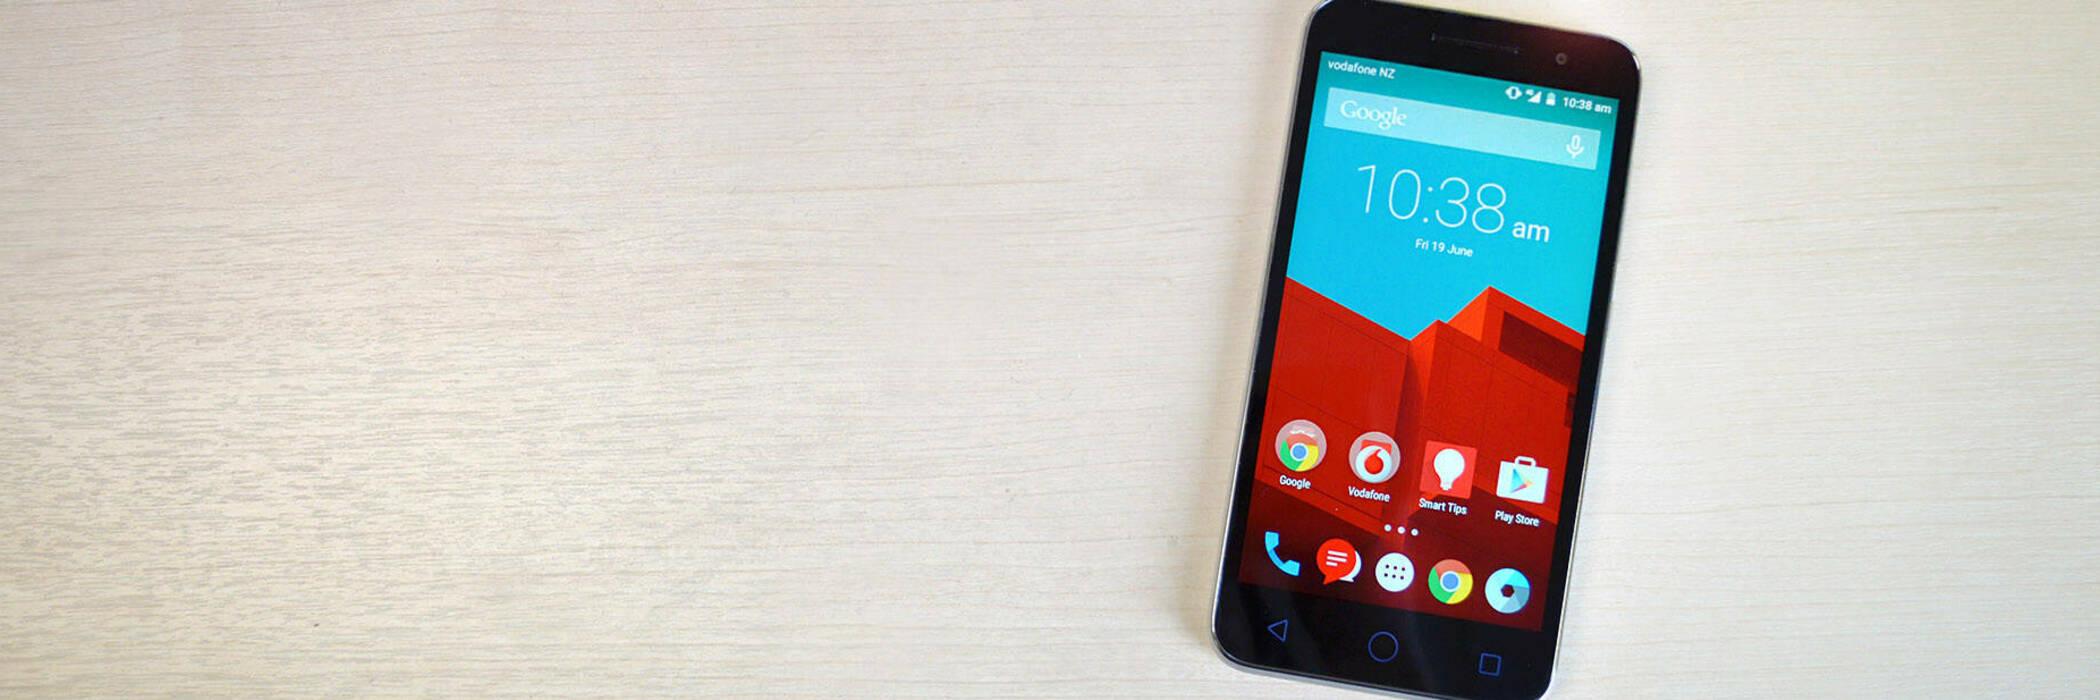 Vodafone smart prime 6 hero3